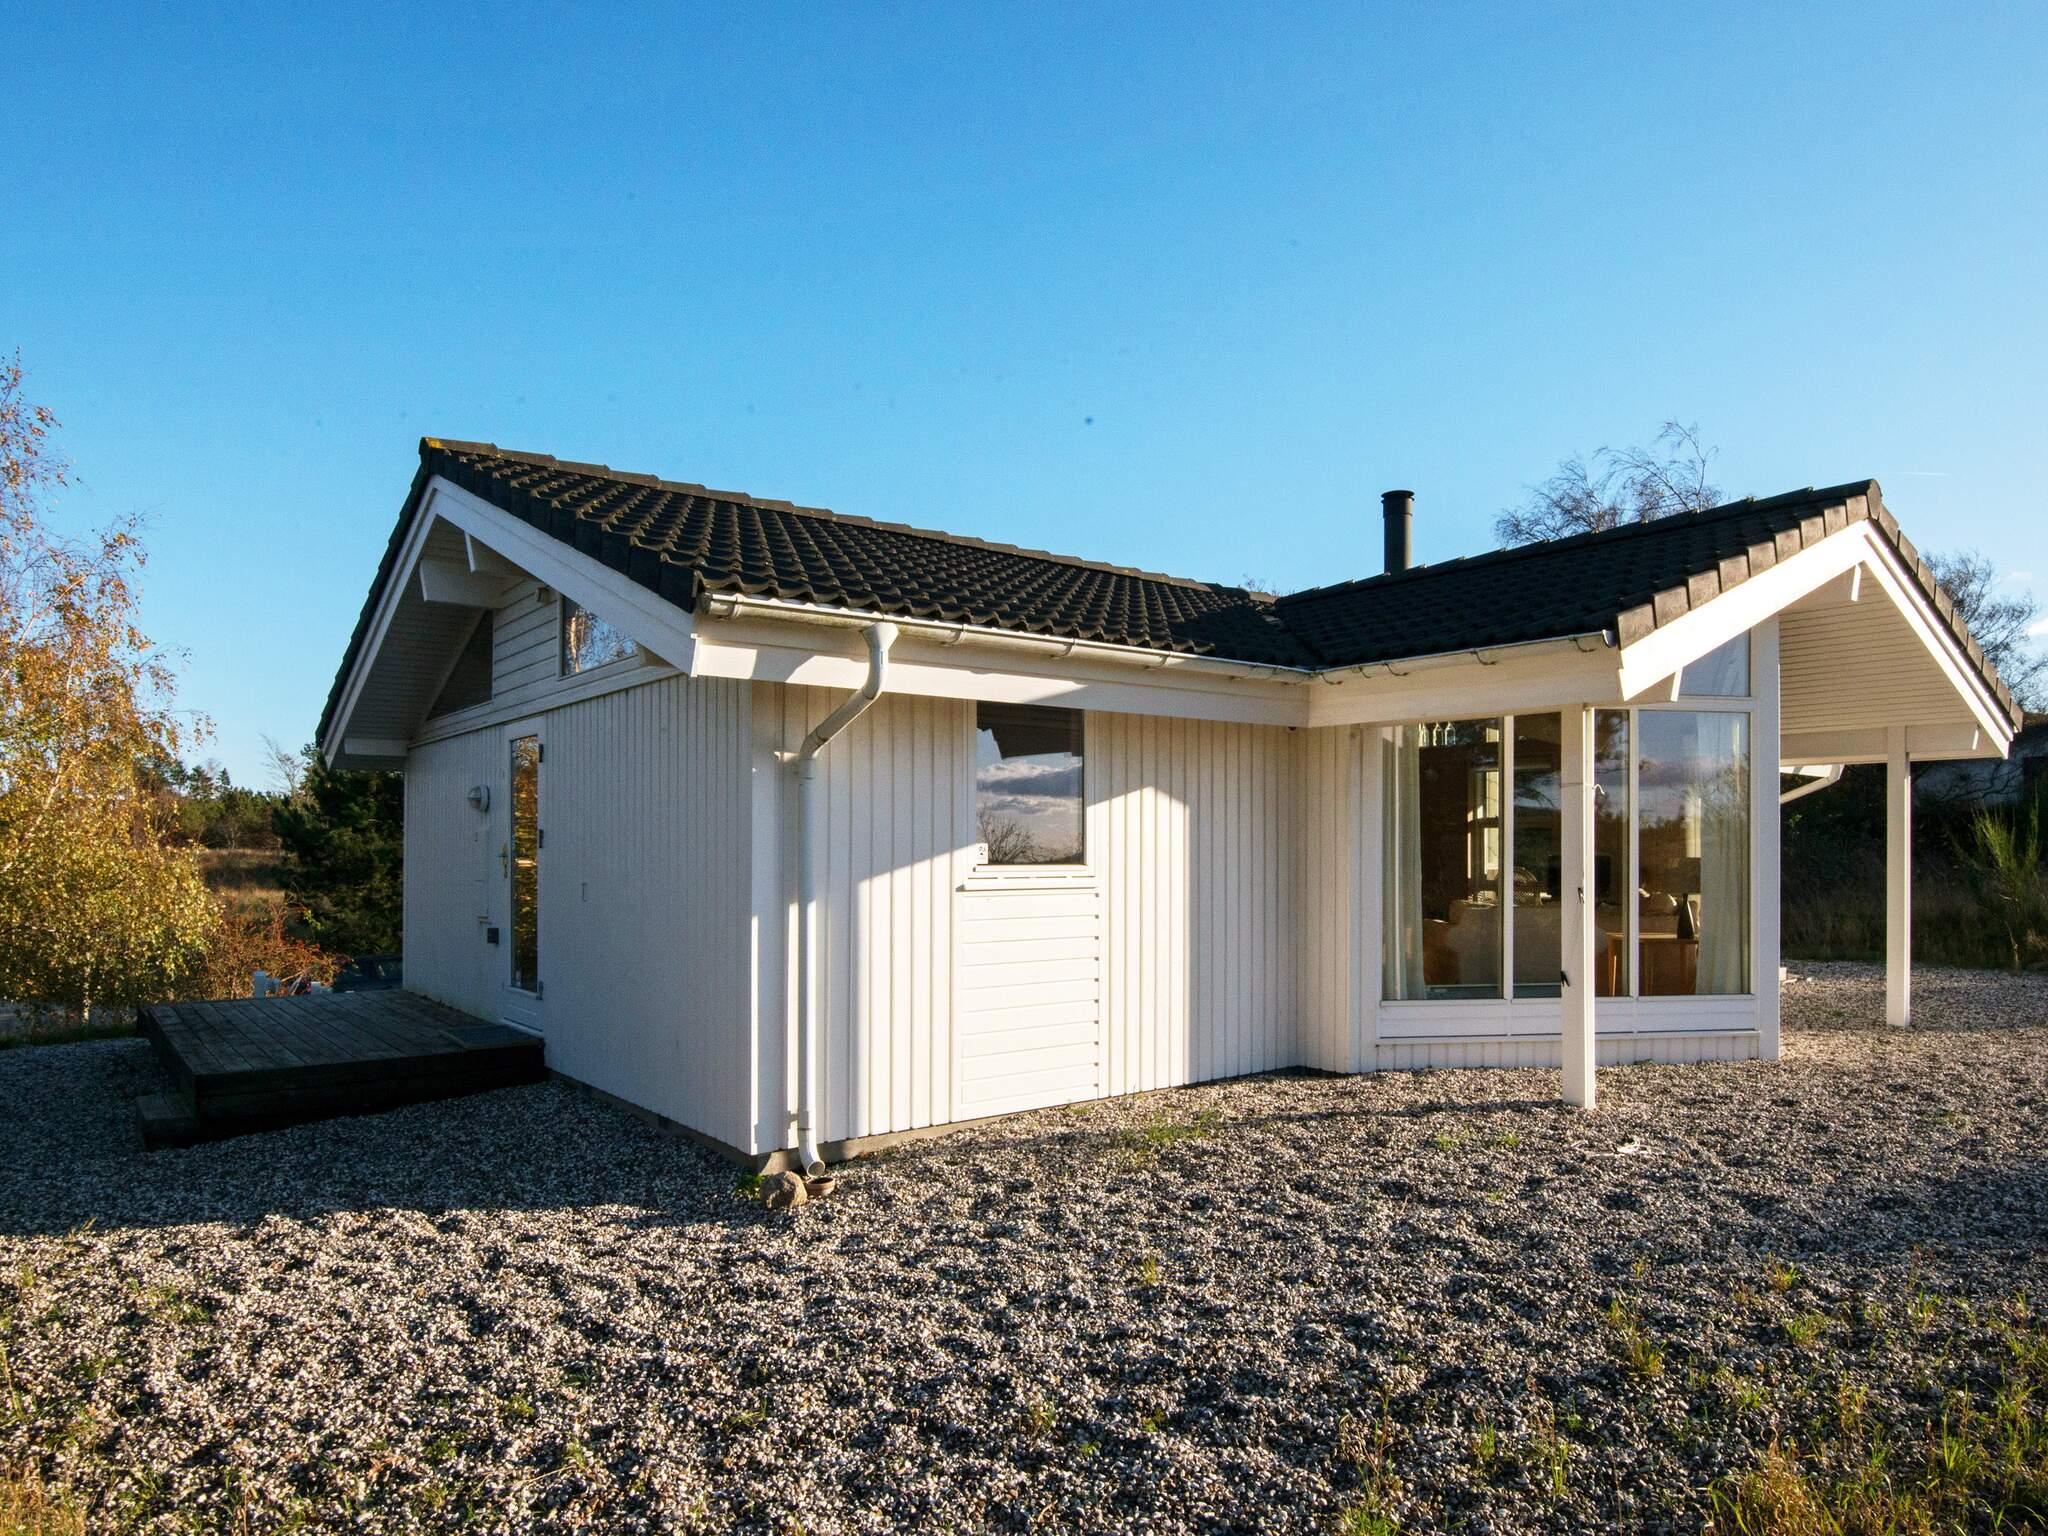 Maison de vacances Helgenæs (681779), Knebel, , Mer Baltique danoise, Danemark, image 15